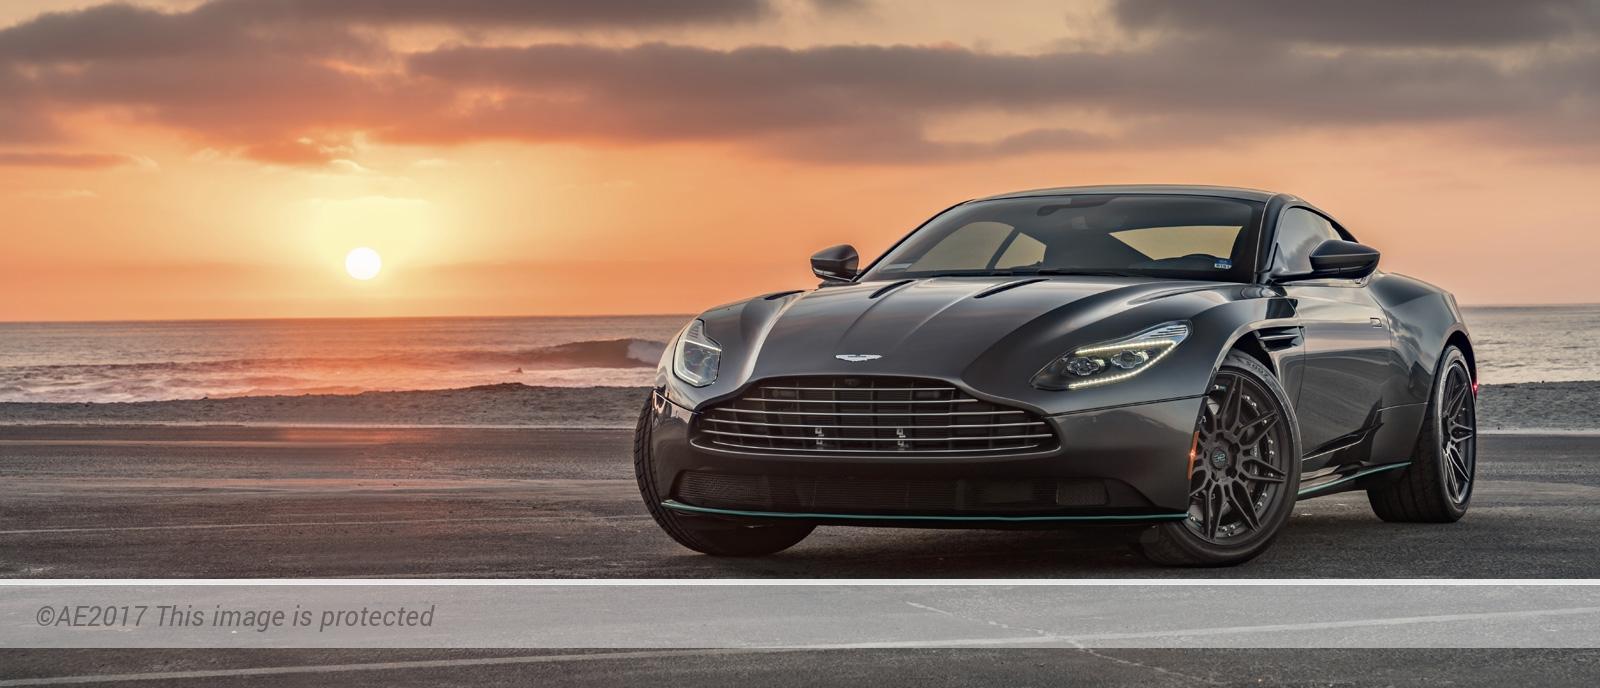 Always Evolving x Aston Martin DB11 AMR